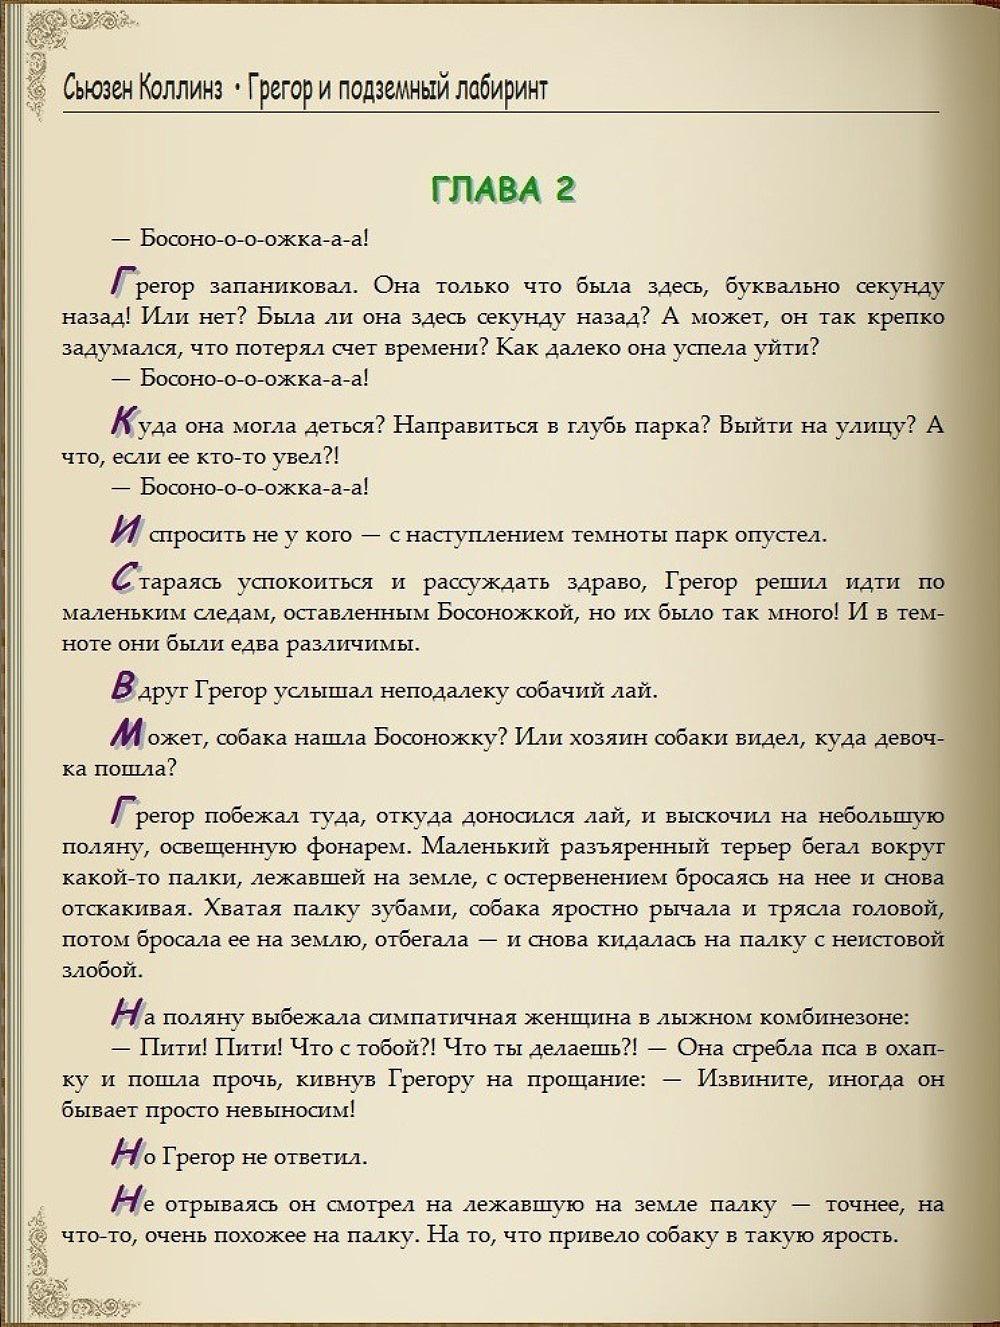 http://i5.imageban.ru/out/2013/12/27/f88a4c71d3799a242ea53d706748566b.jpg